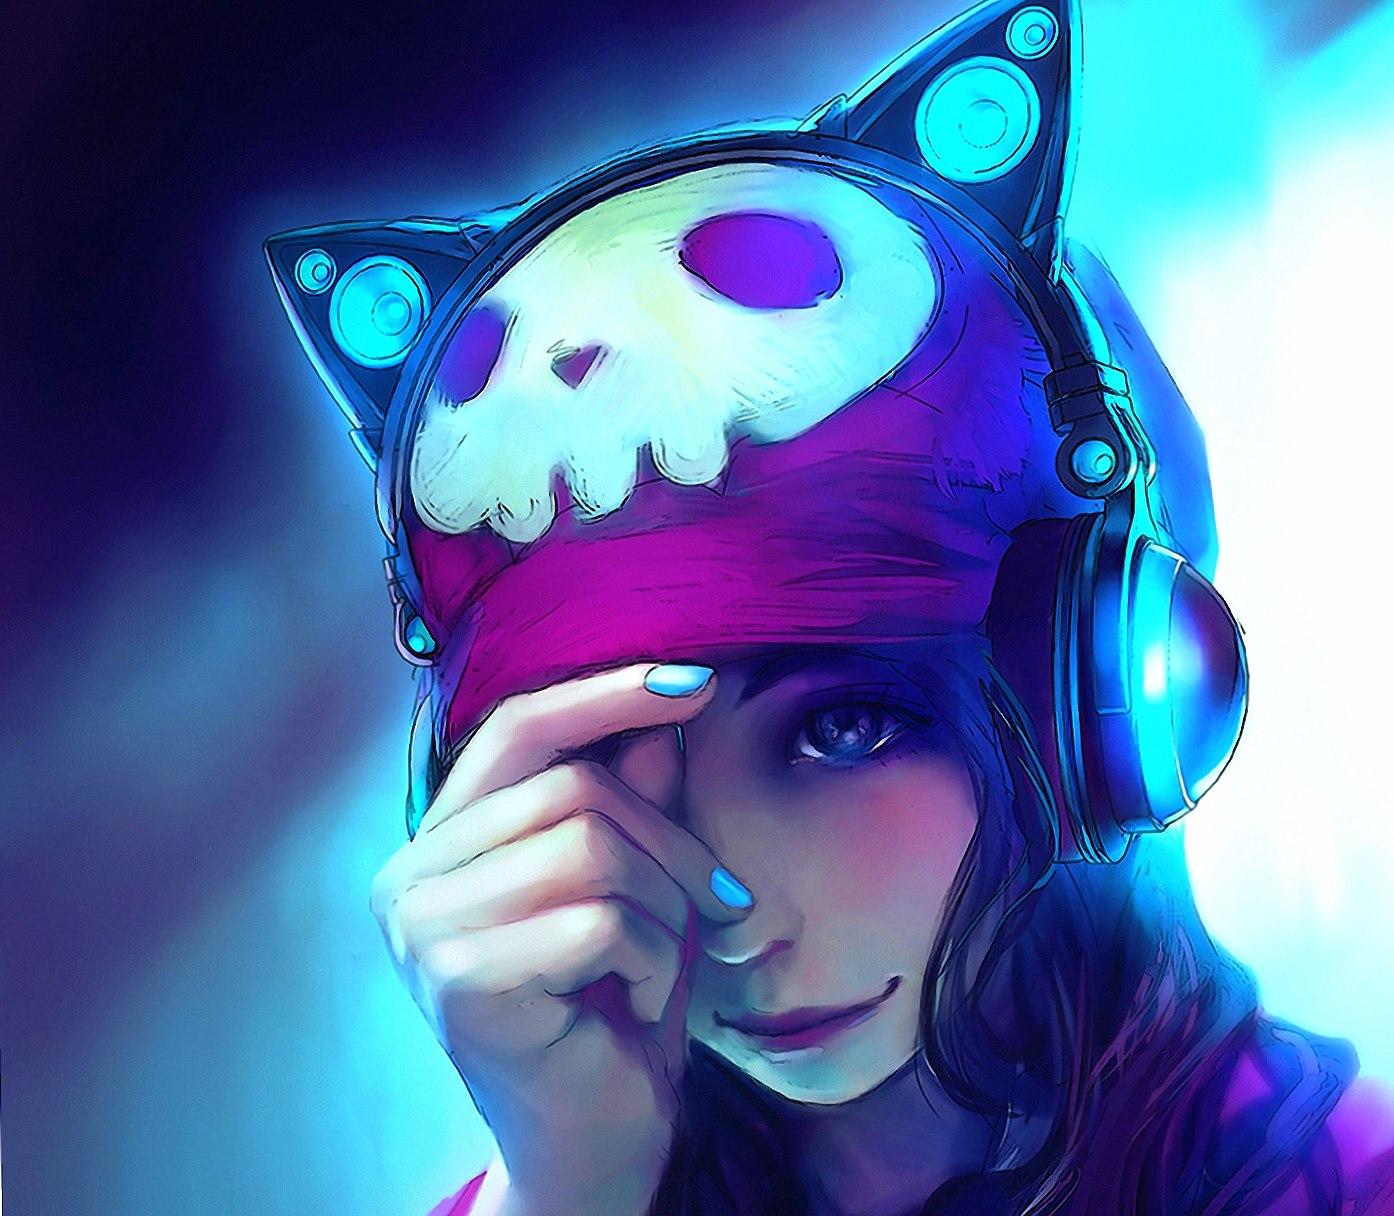 Красивые картинки на аву аниме девушки тик ток